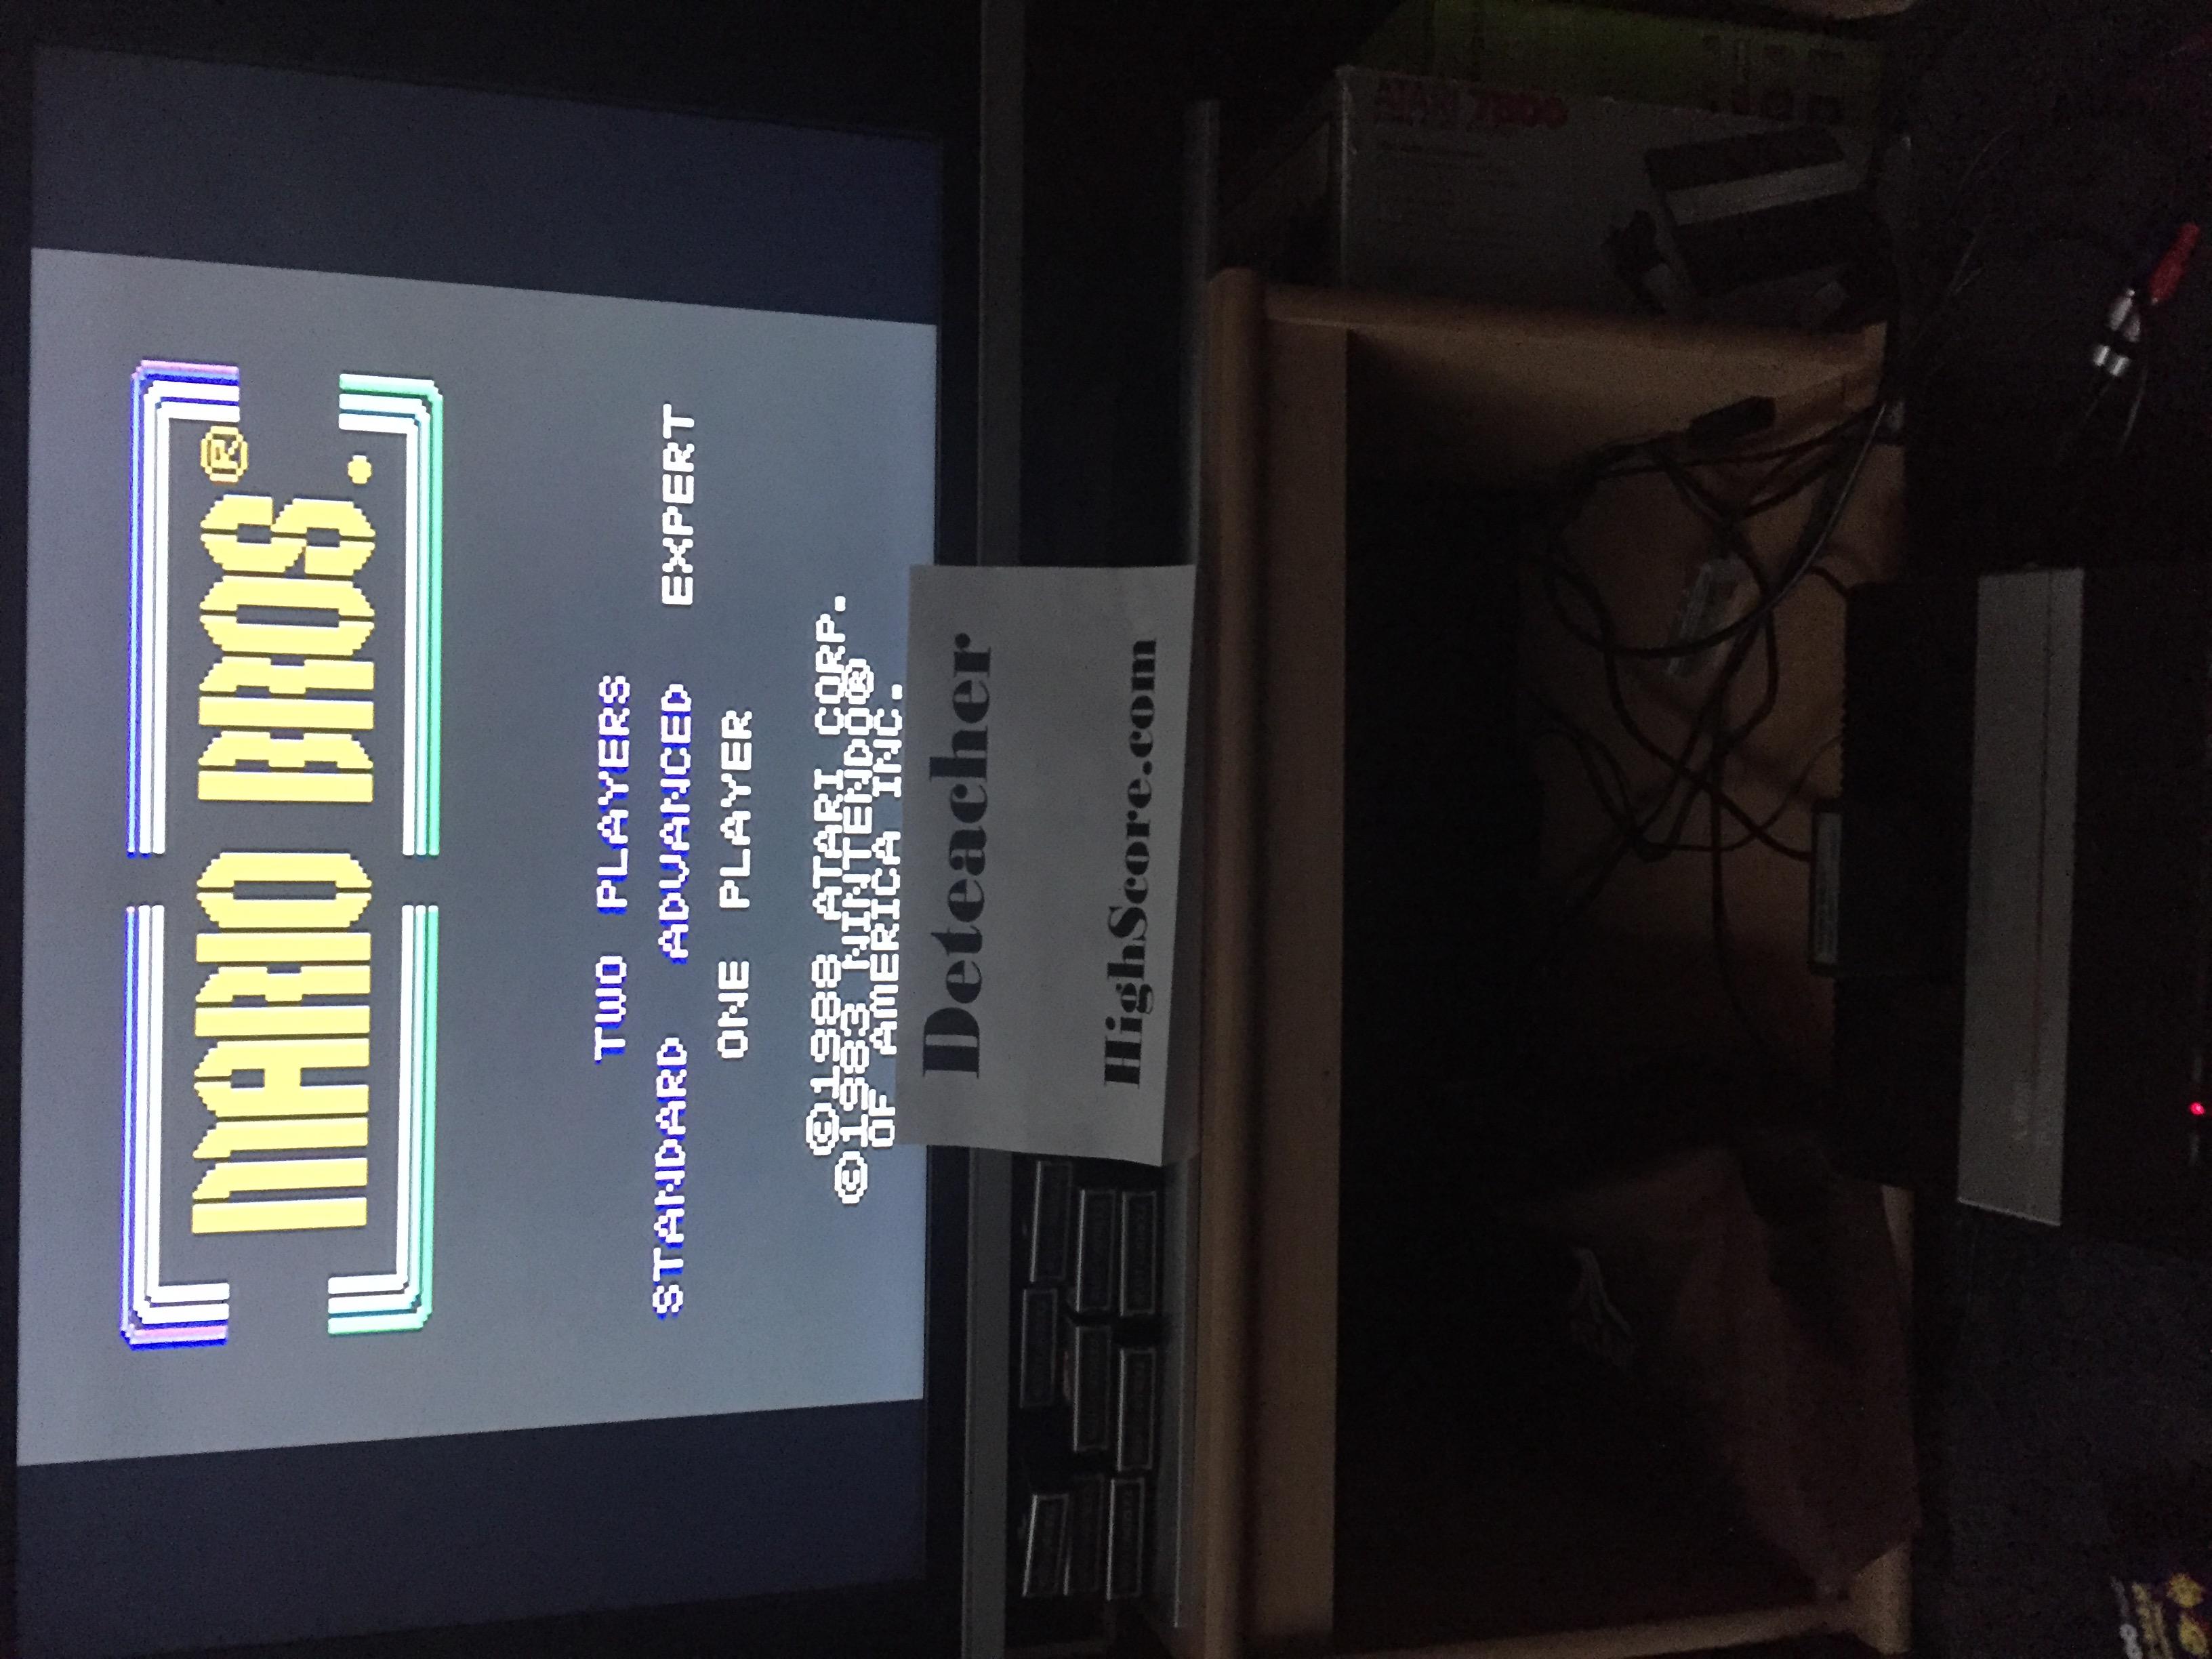 Deteacher: Mario Bros. [Expert] (Atari 7800) 49,930 points on 2016-02-15 15:49:04